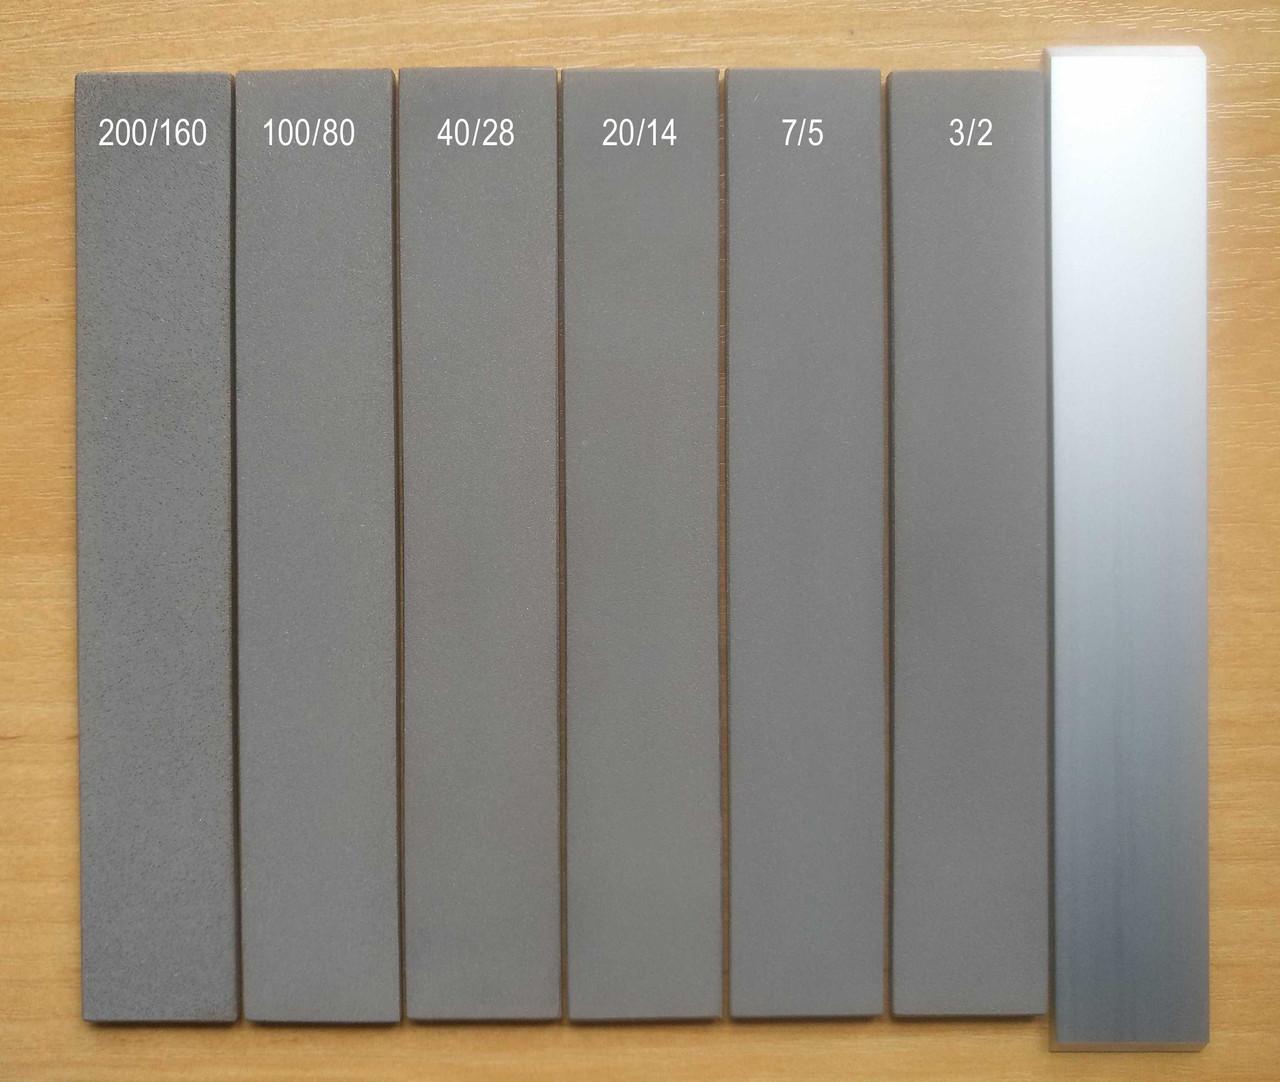 Брусок Эльборовый ПРЕМИУМ 150х25х3 зер.200/160 для ножа